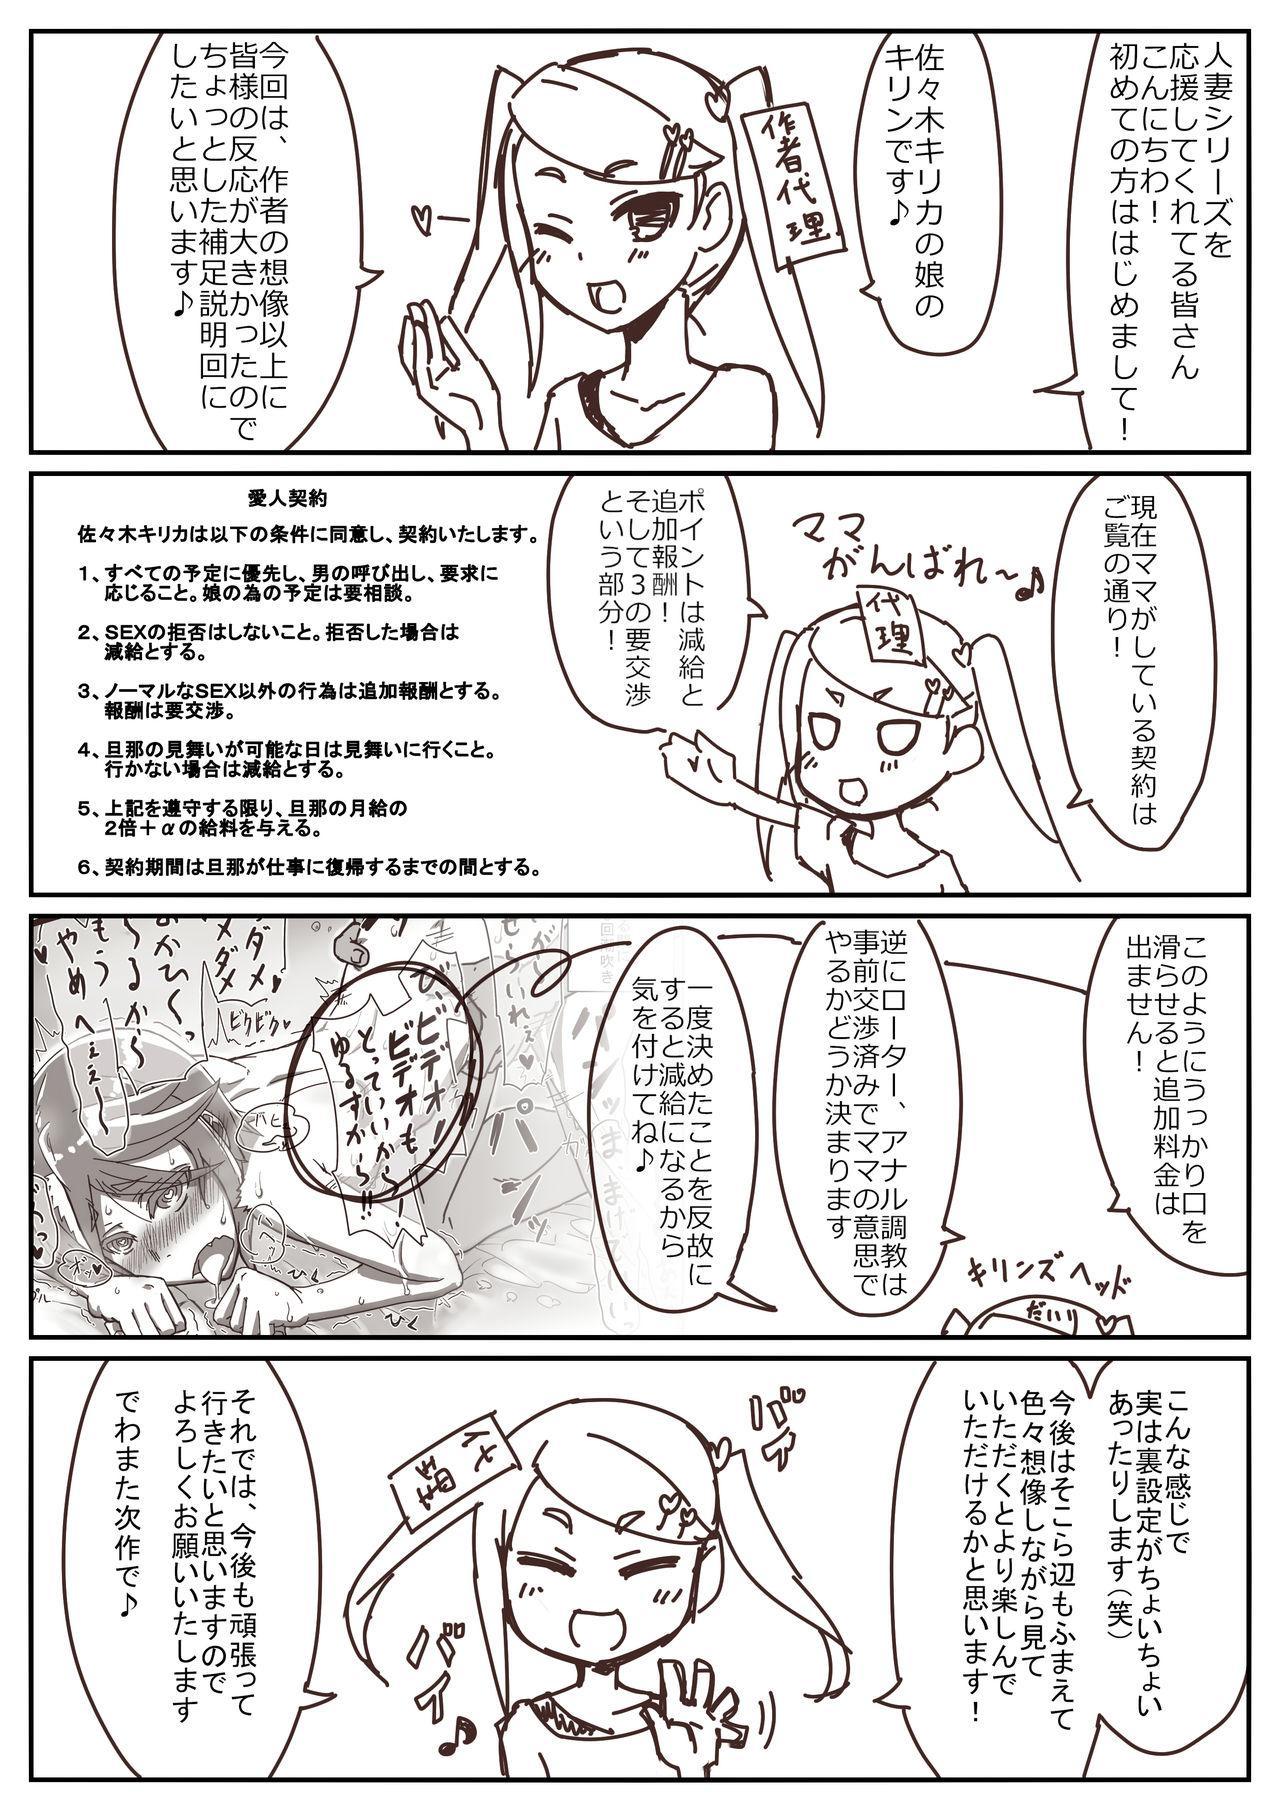 Hitozuma Kirika 150